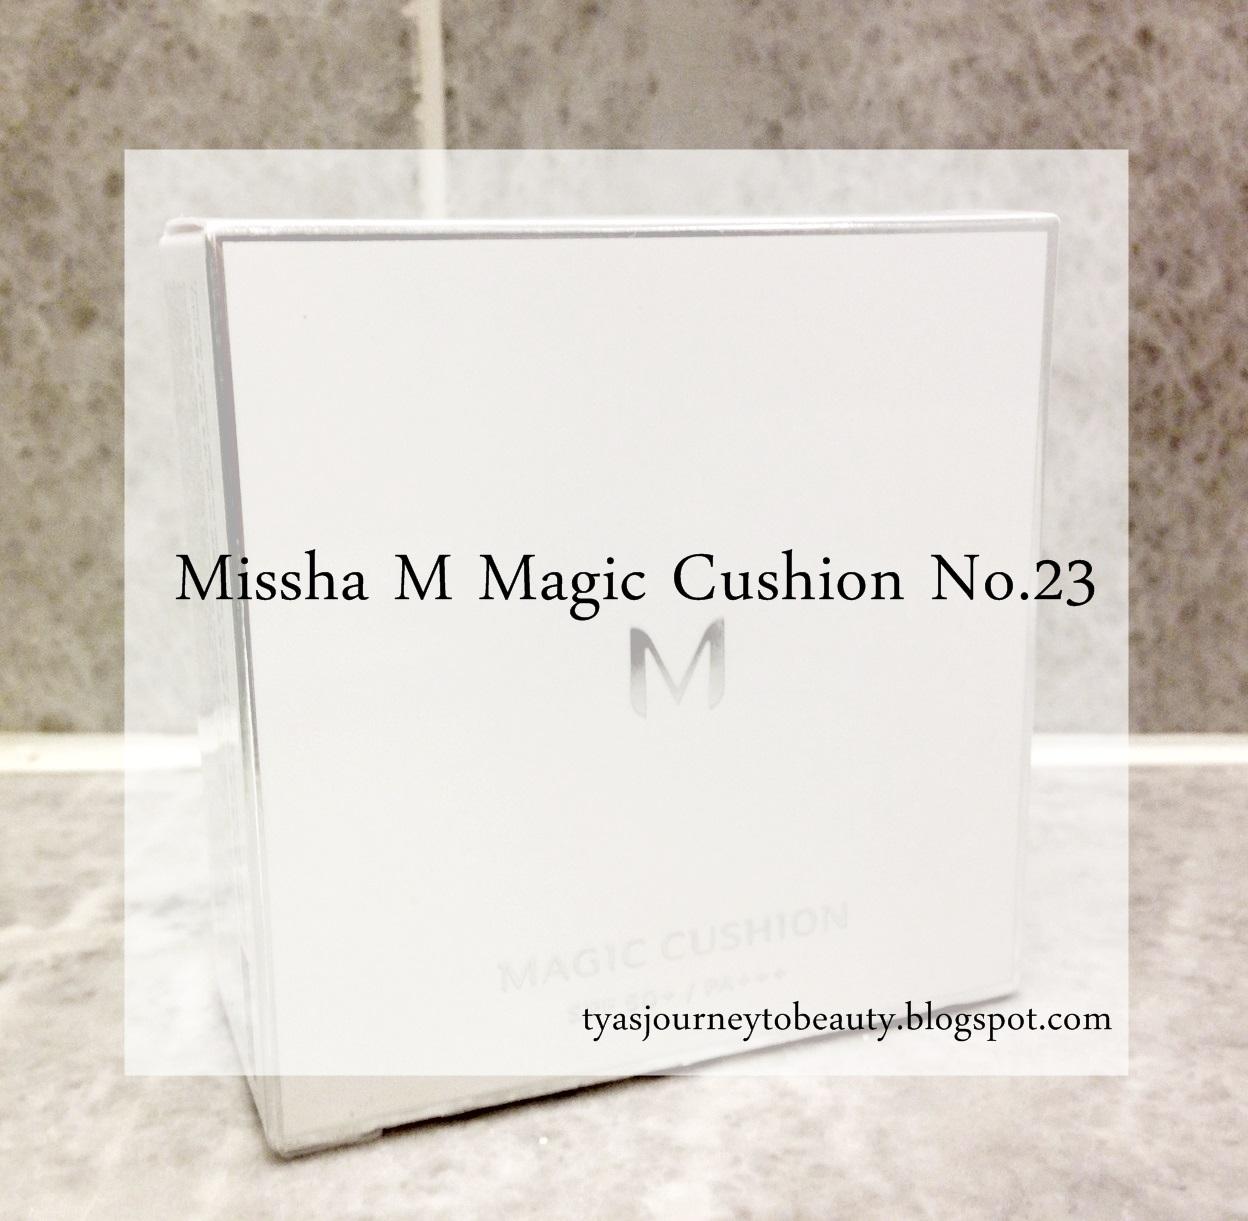 Colors Of Sunset Review Missha M Magic Cushion No 23